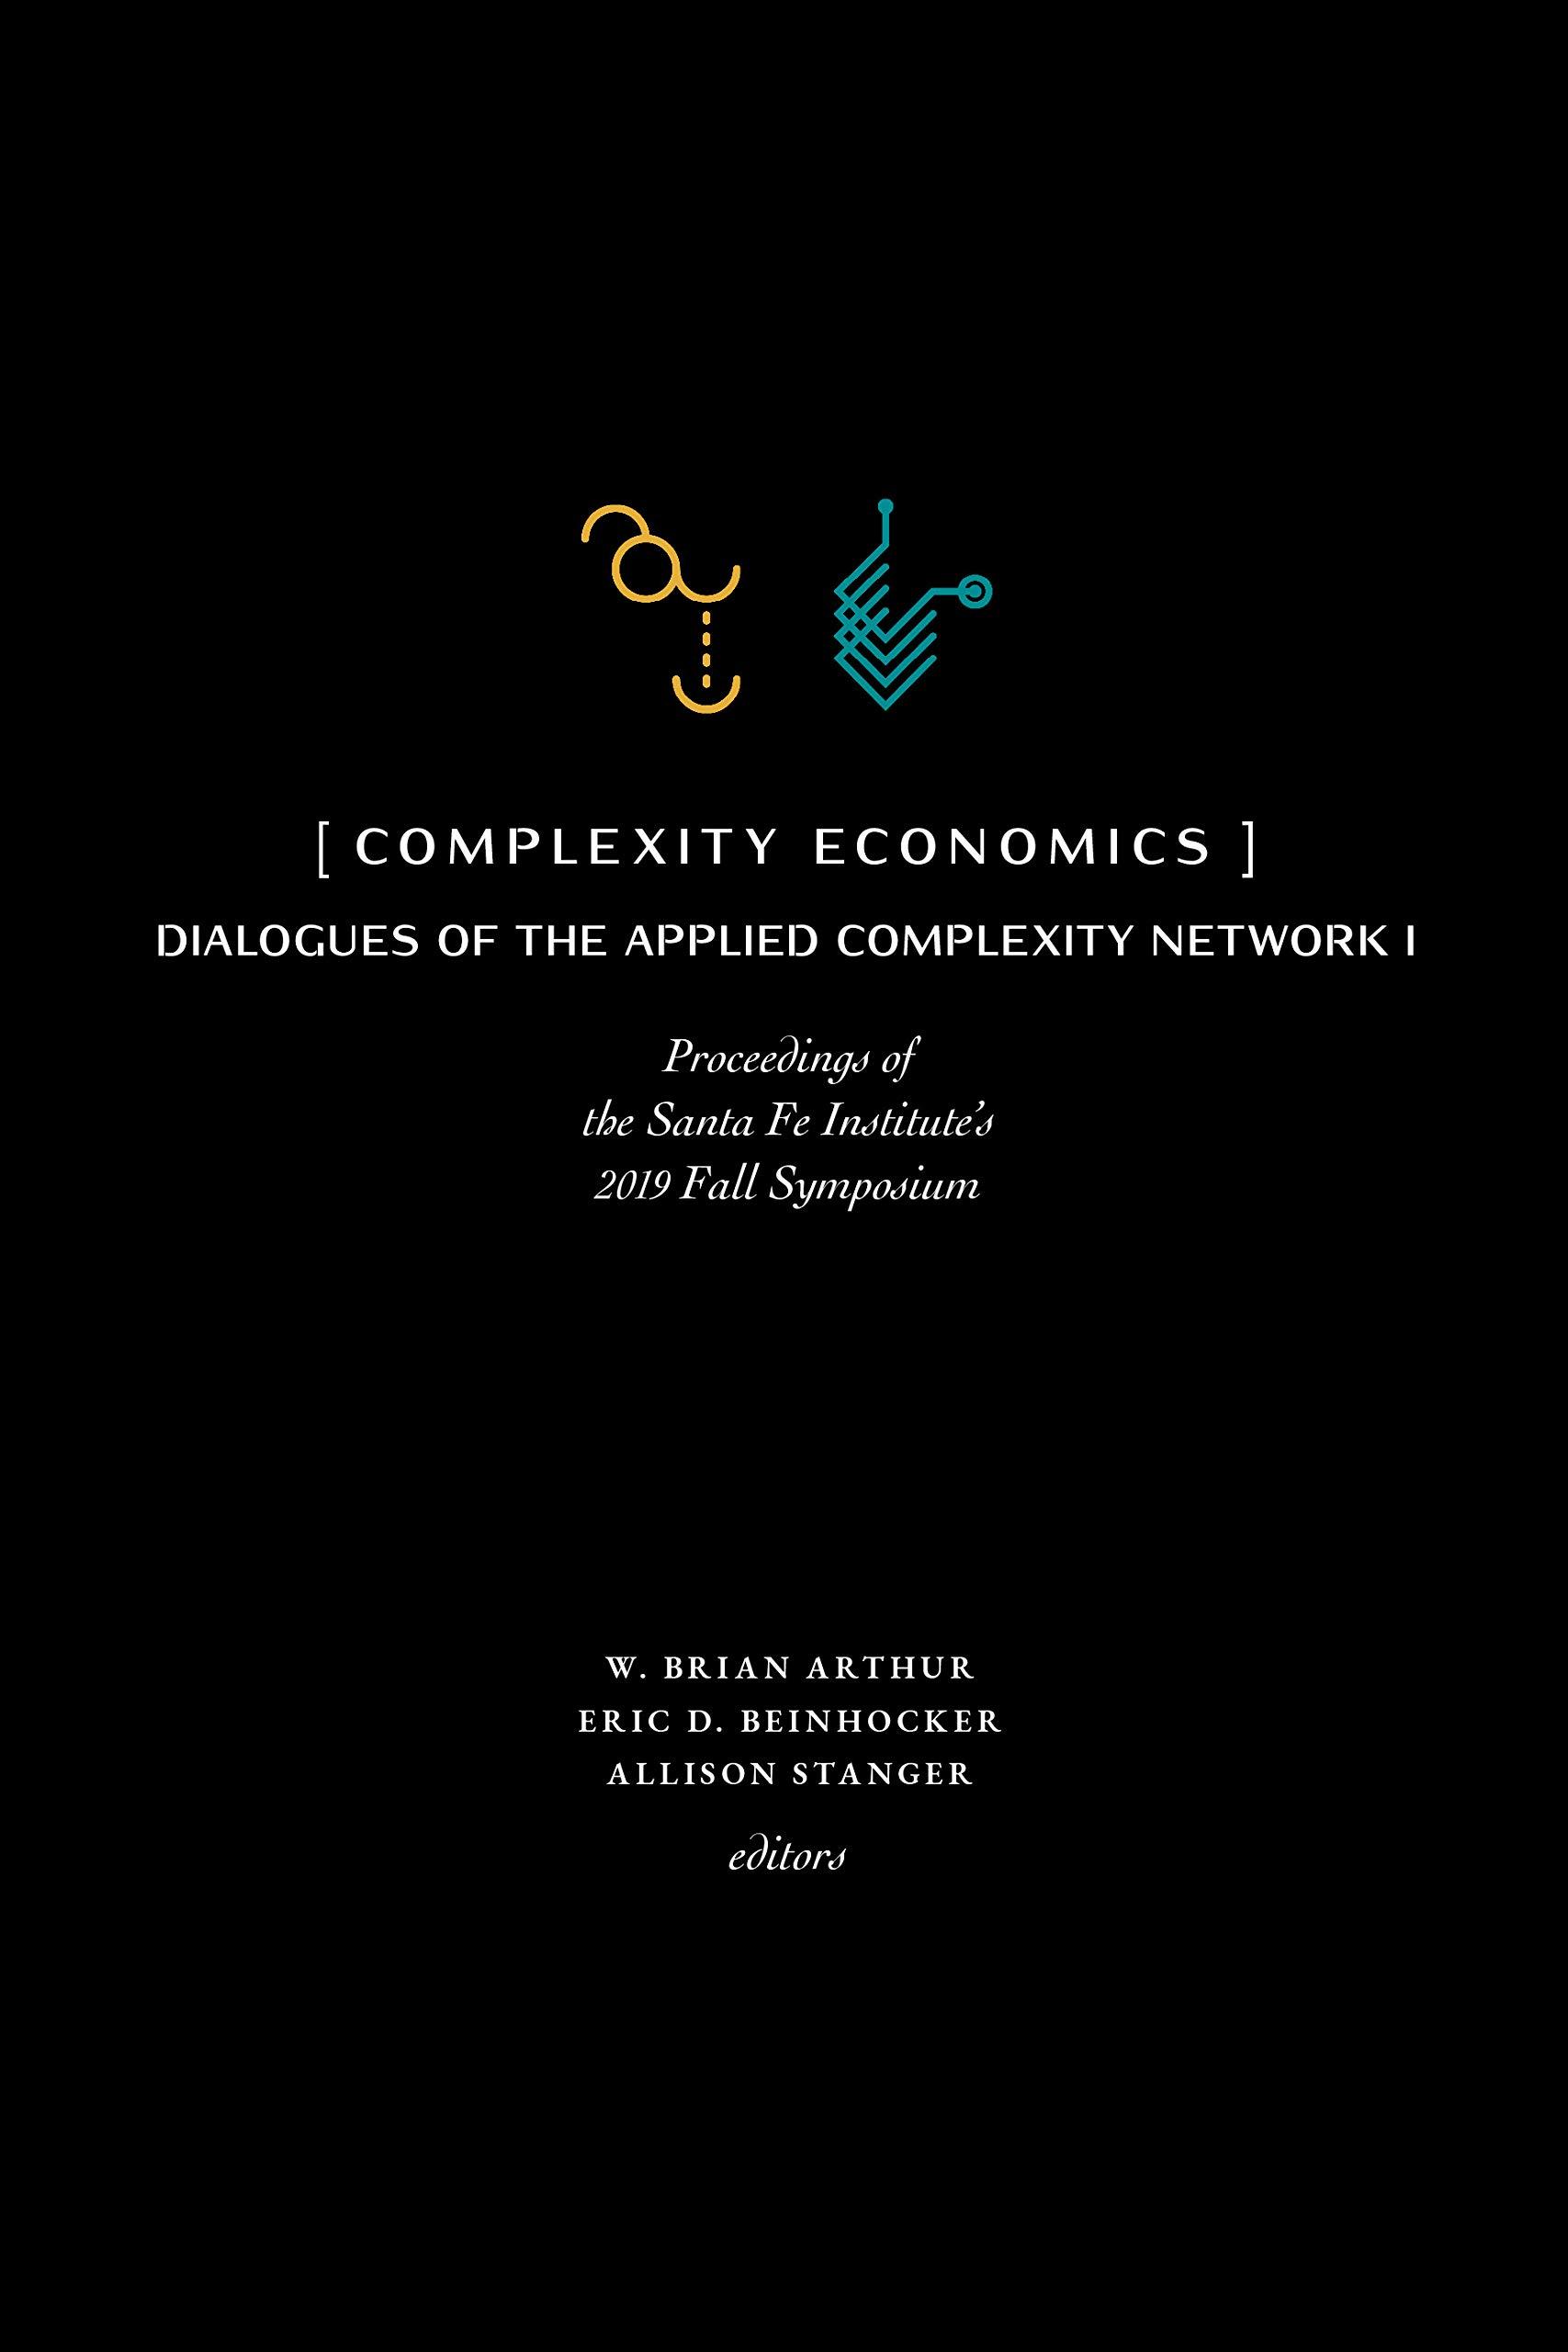 Complexity Economics: Proceedings of the Santa Fe Institute's 2019 Fall Symposium